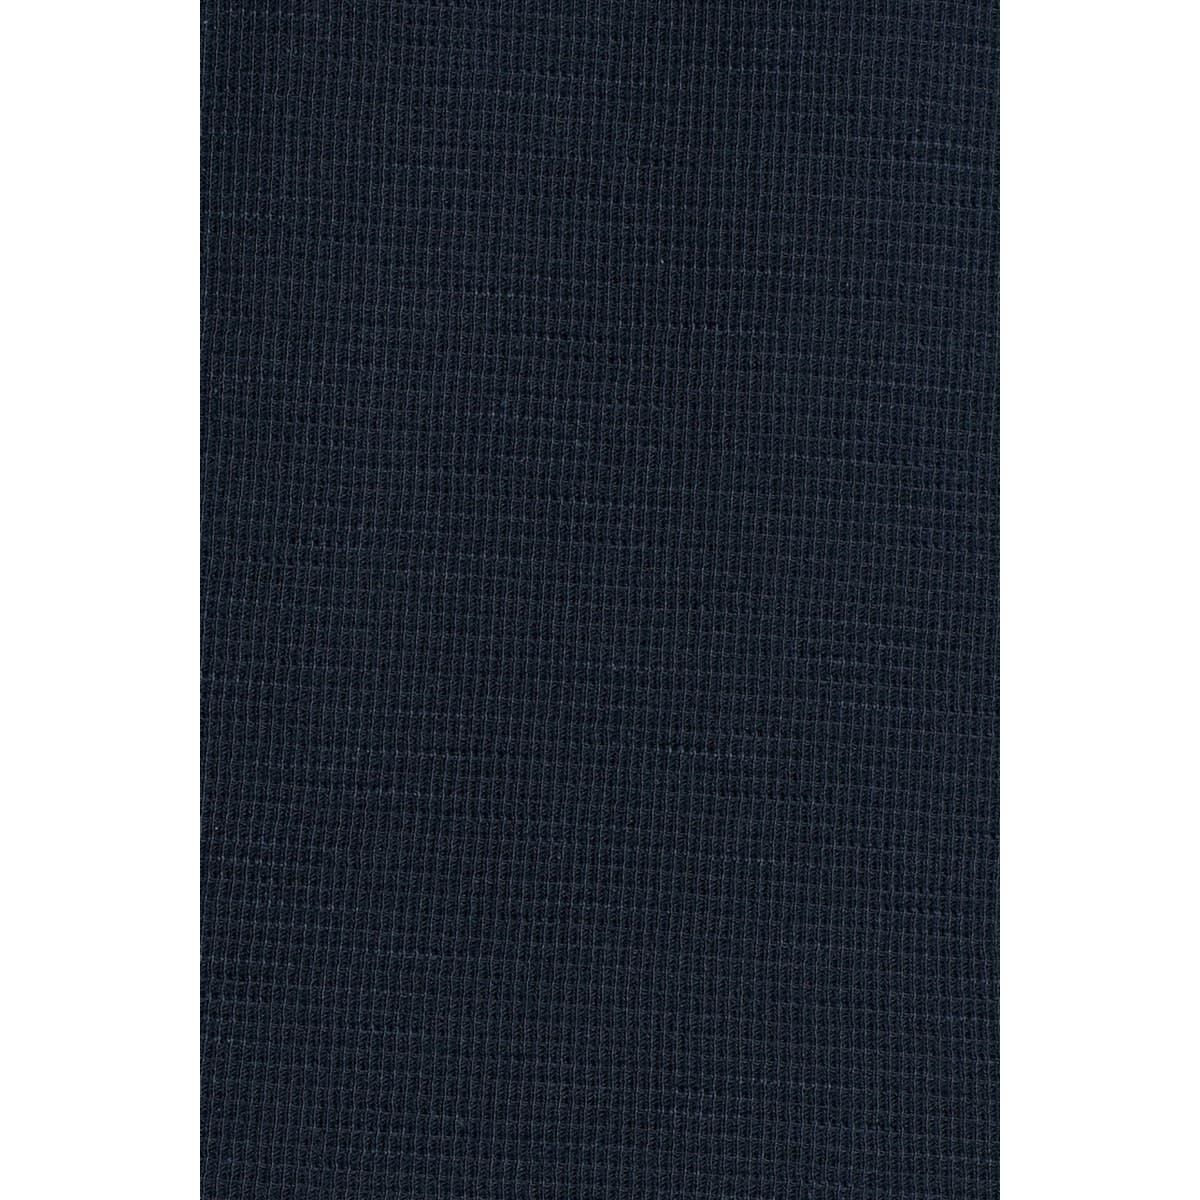 Uzun Kol Penye Mürekkep Mavi